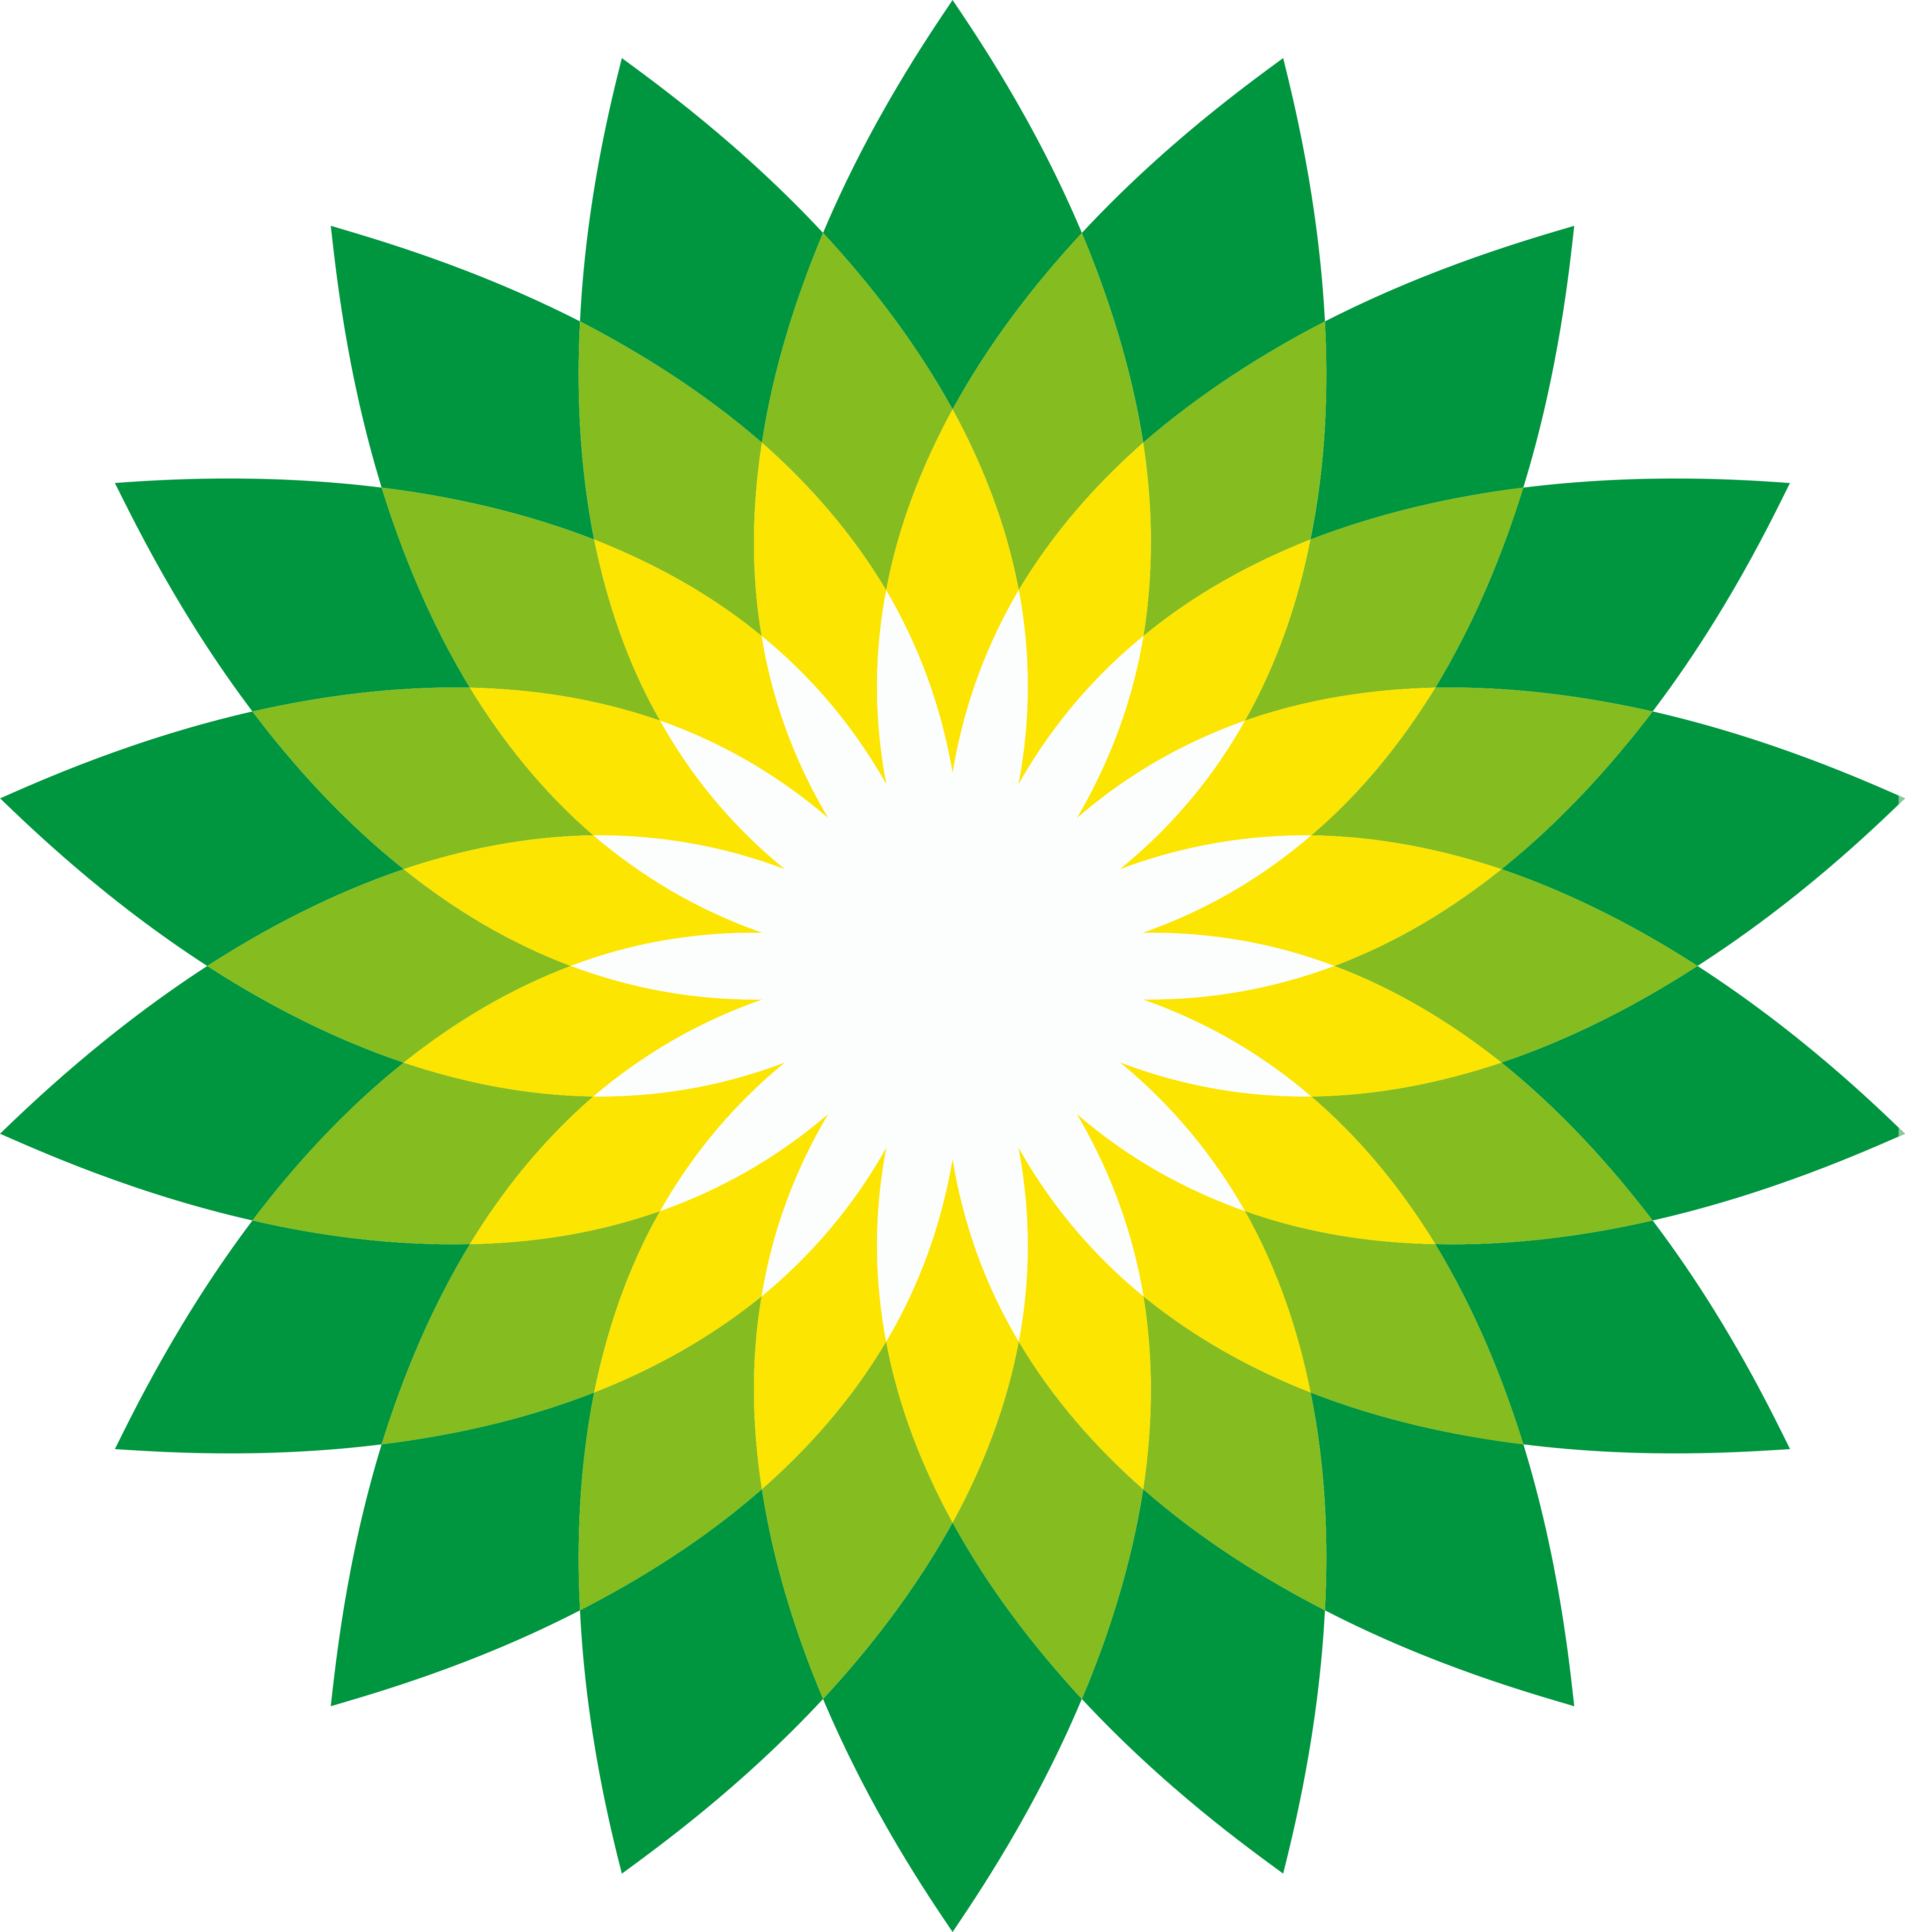 bp logo 7 - BP Logo